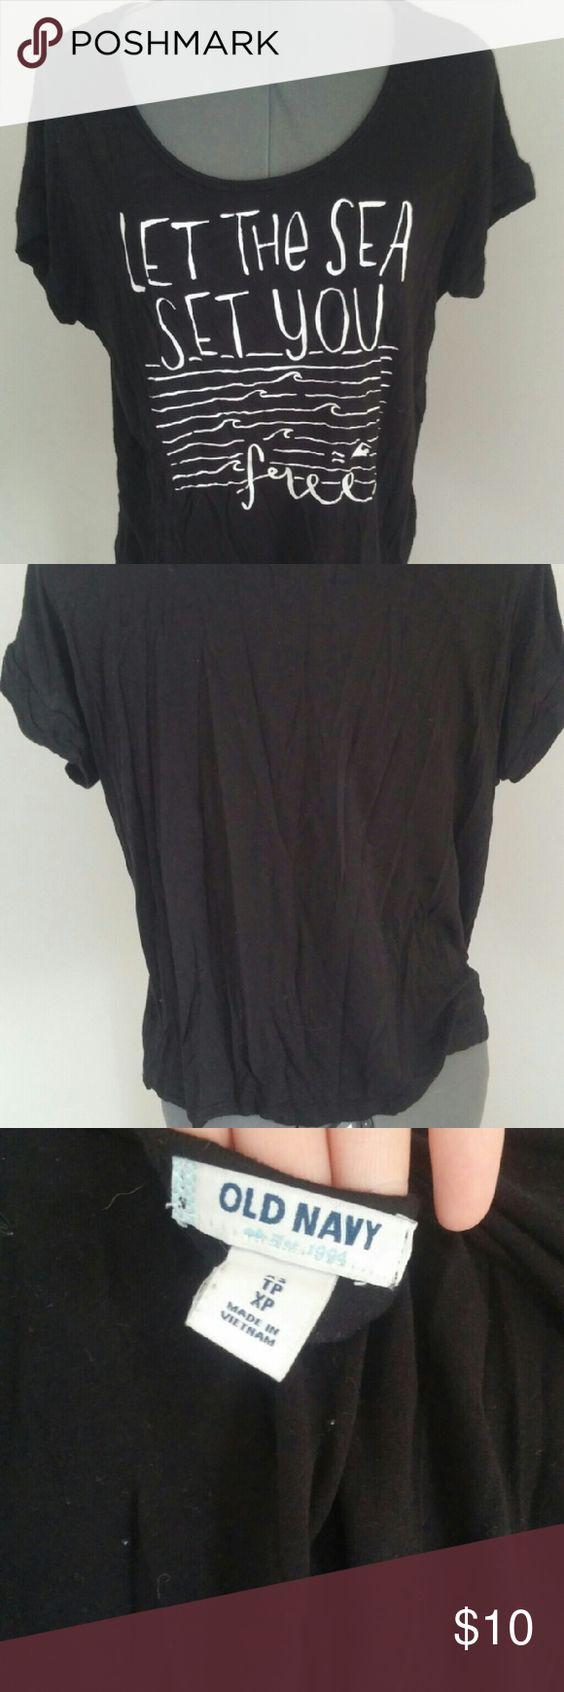 Black t shirt old navy -  Let The Sea Set You Free Black Shirt Old Navy Black Sea Themed Slouchy